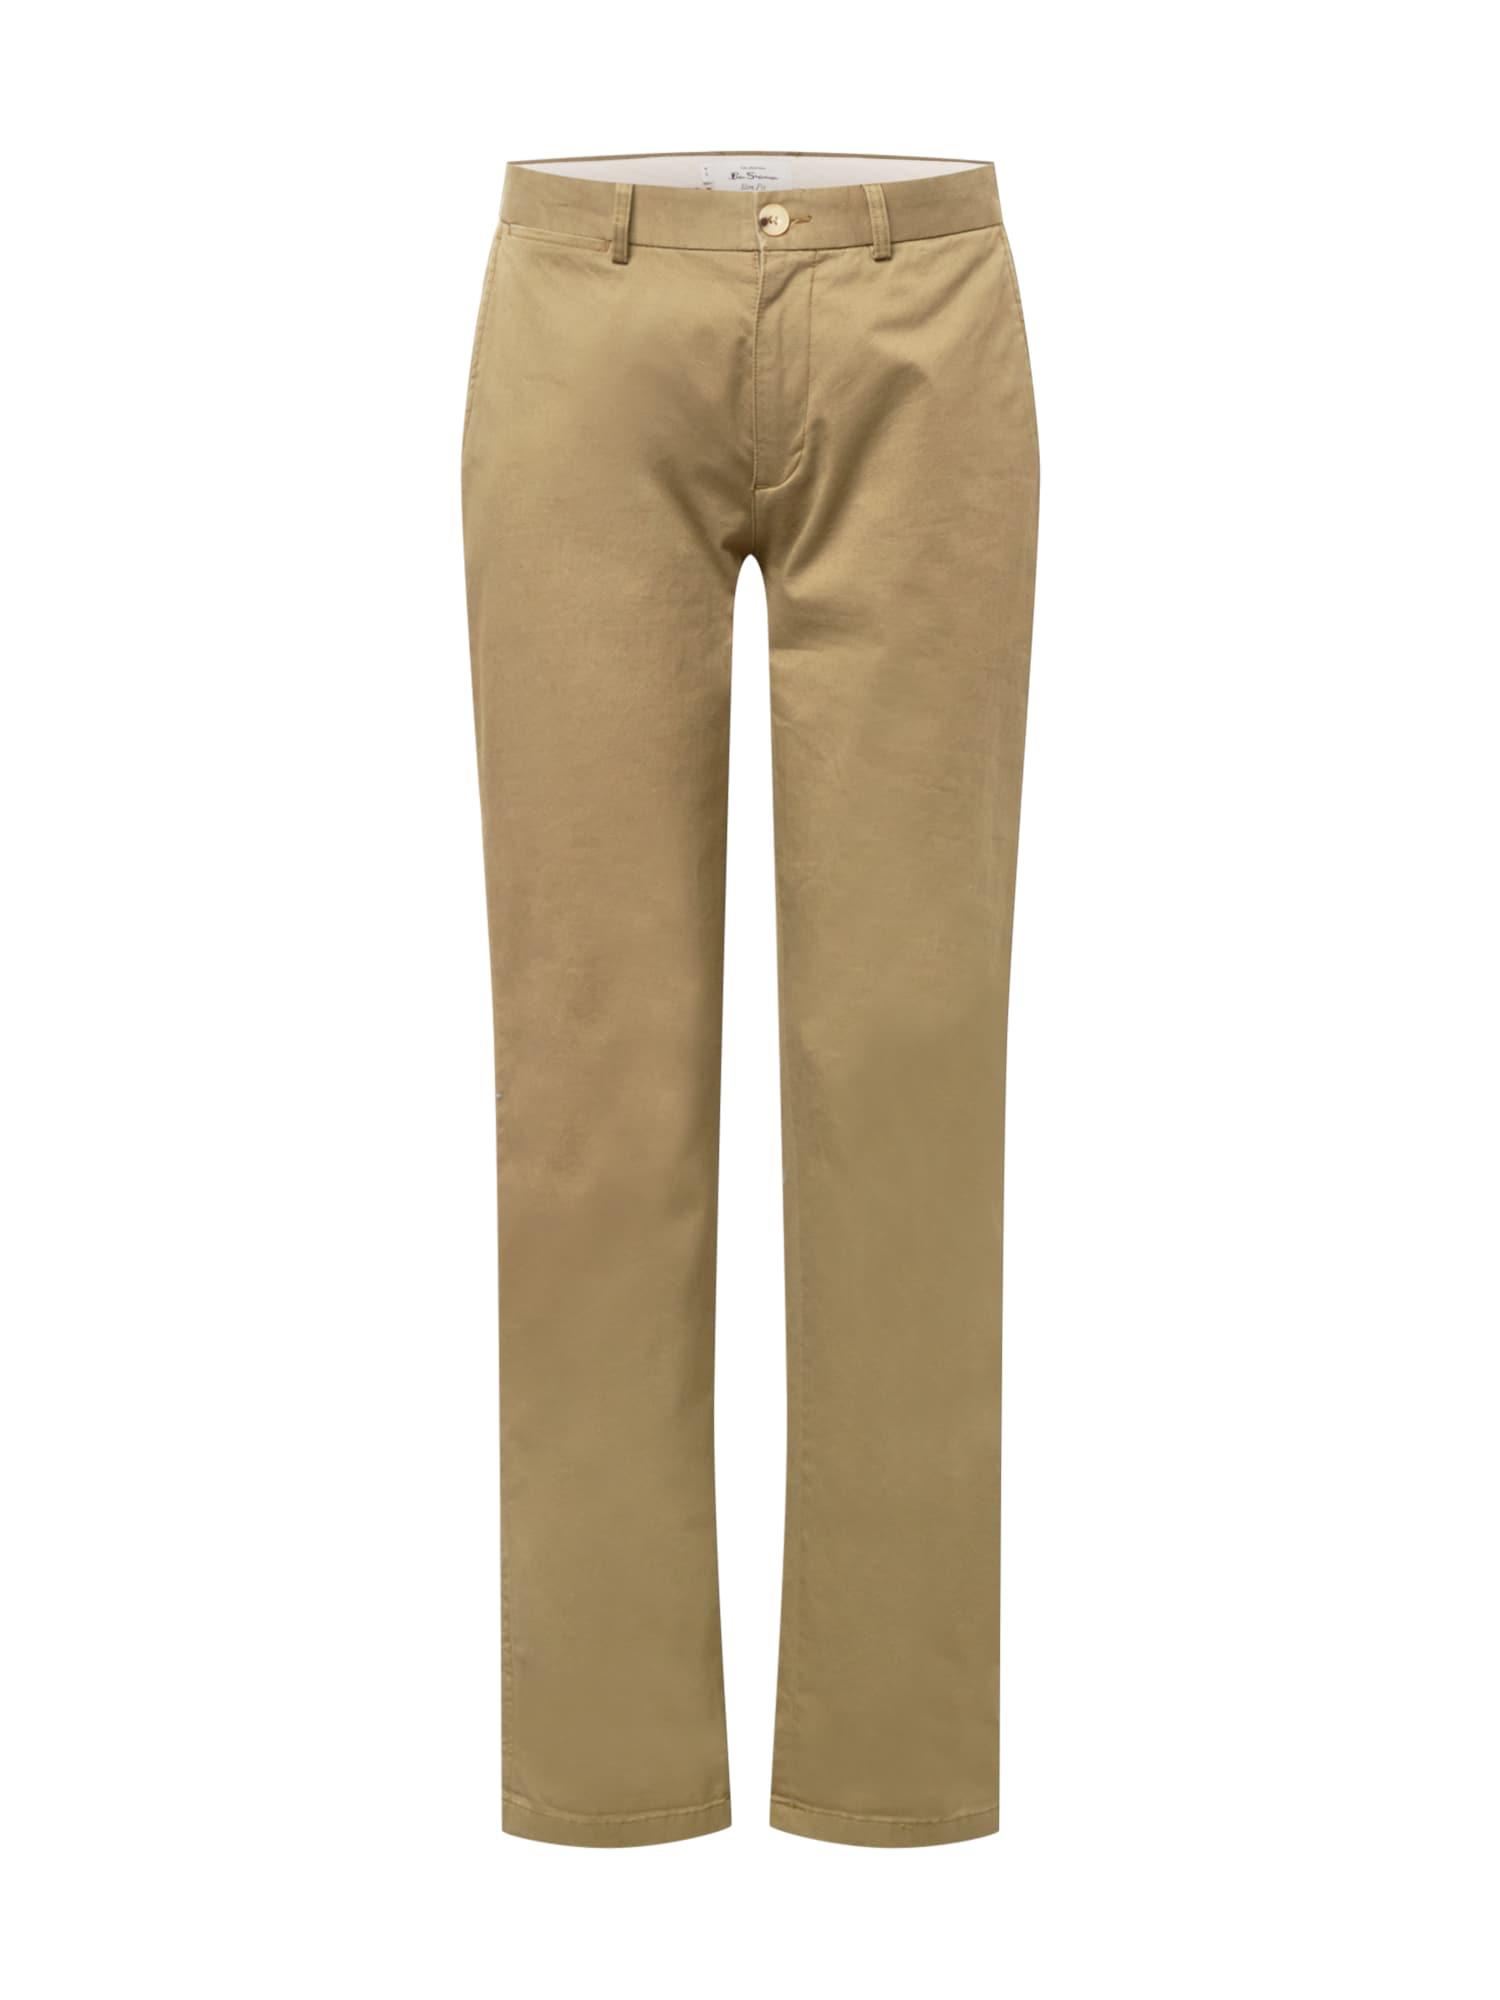 "Ben Sherman ""Chino"" stiliaus kelnės nendrių spalva"